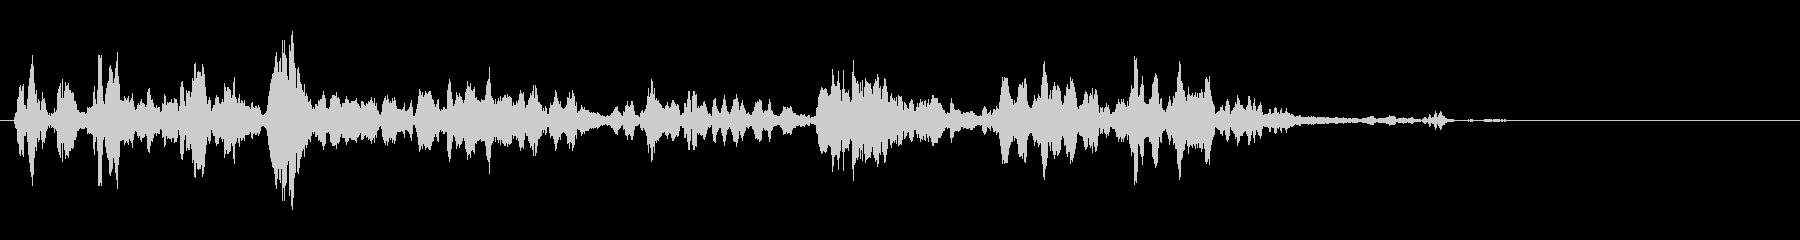 KANT 鳥のロボット声効果音1の未再生の波形